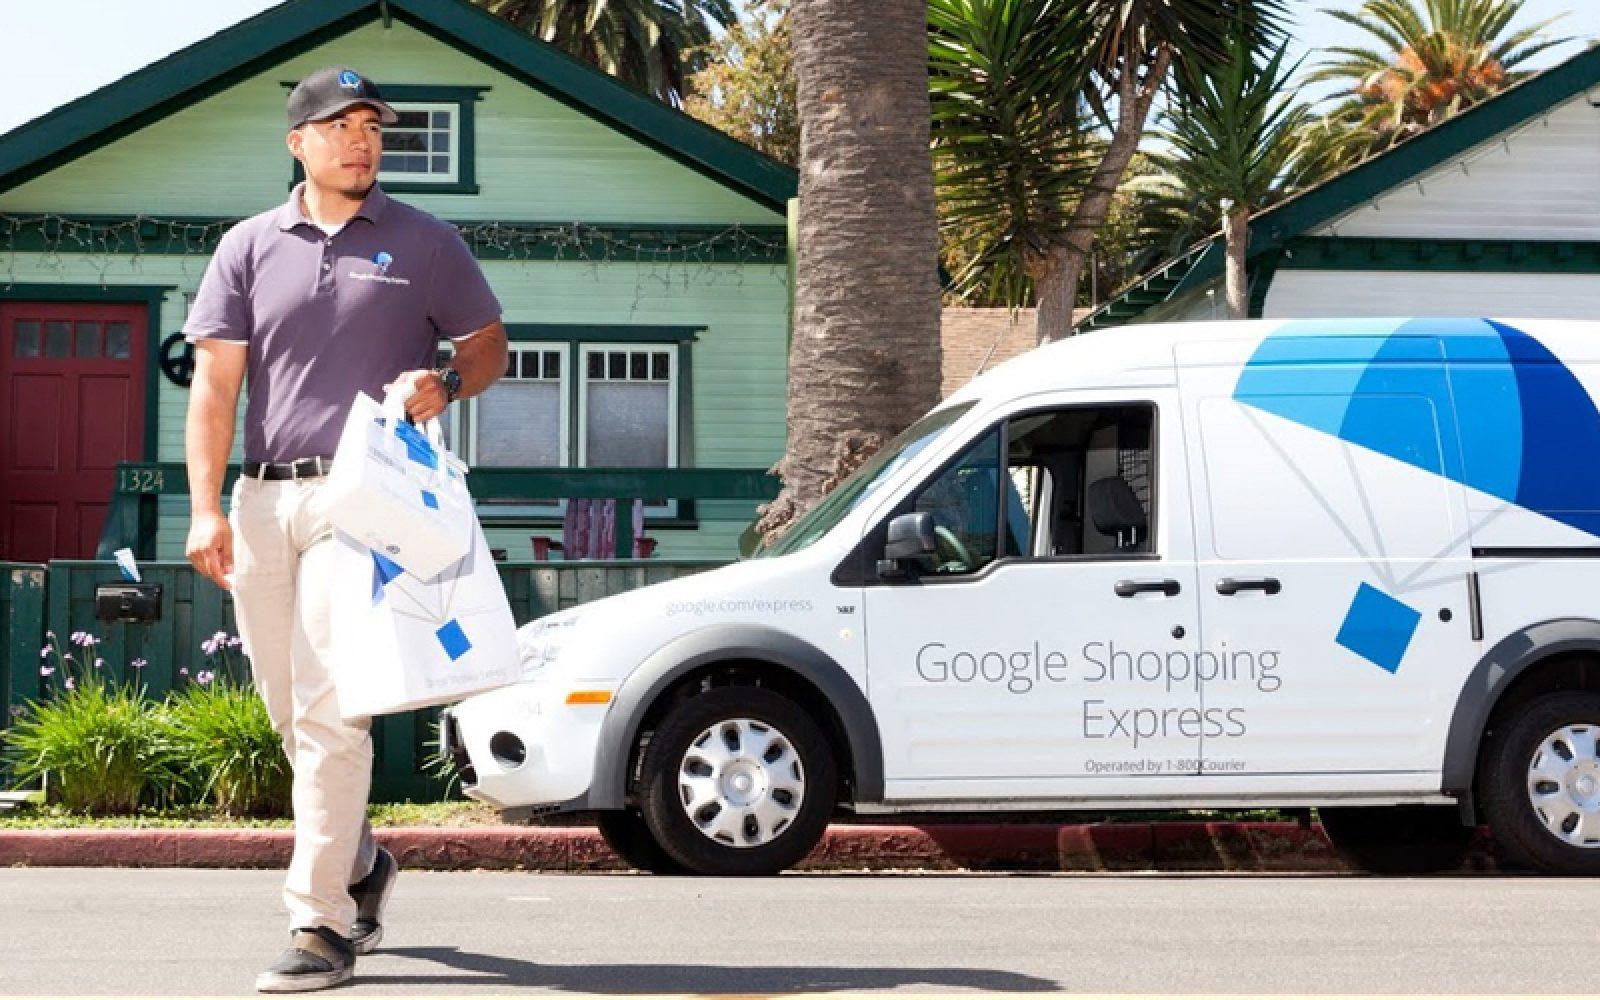 google shopping actions and google express